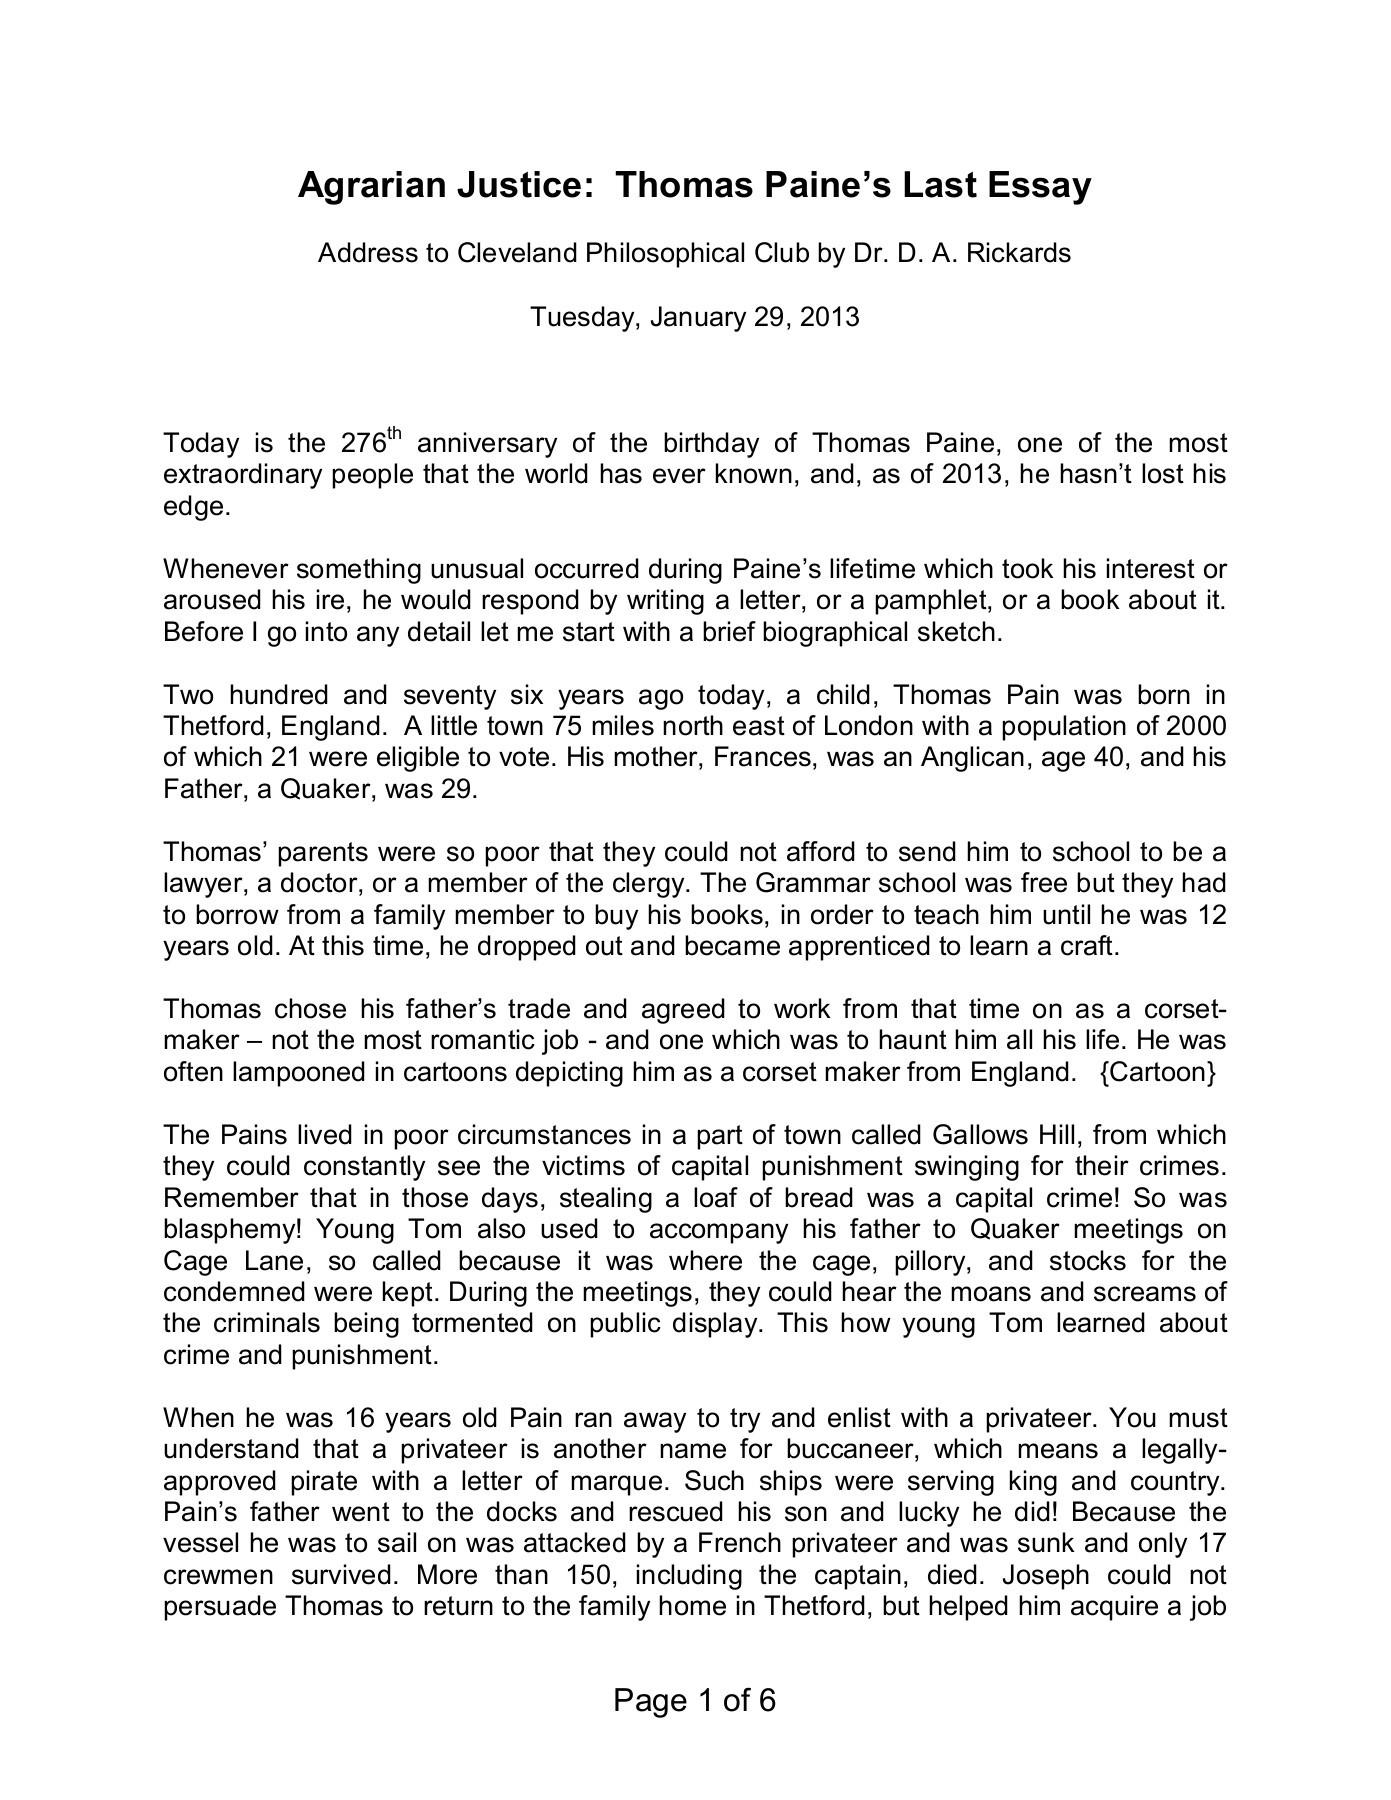 Thomas Paine Essay Thomas Paine American Crisis 02 05